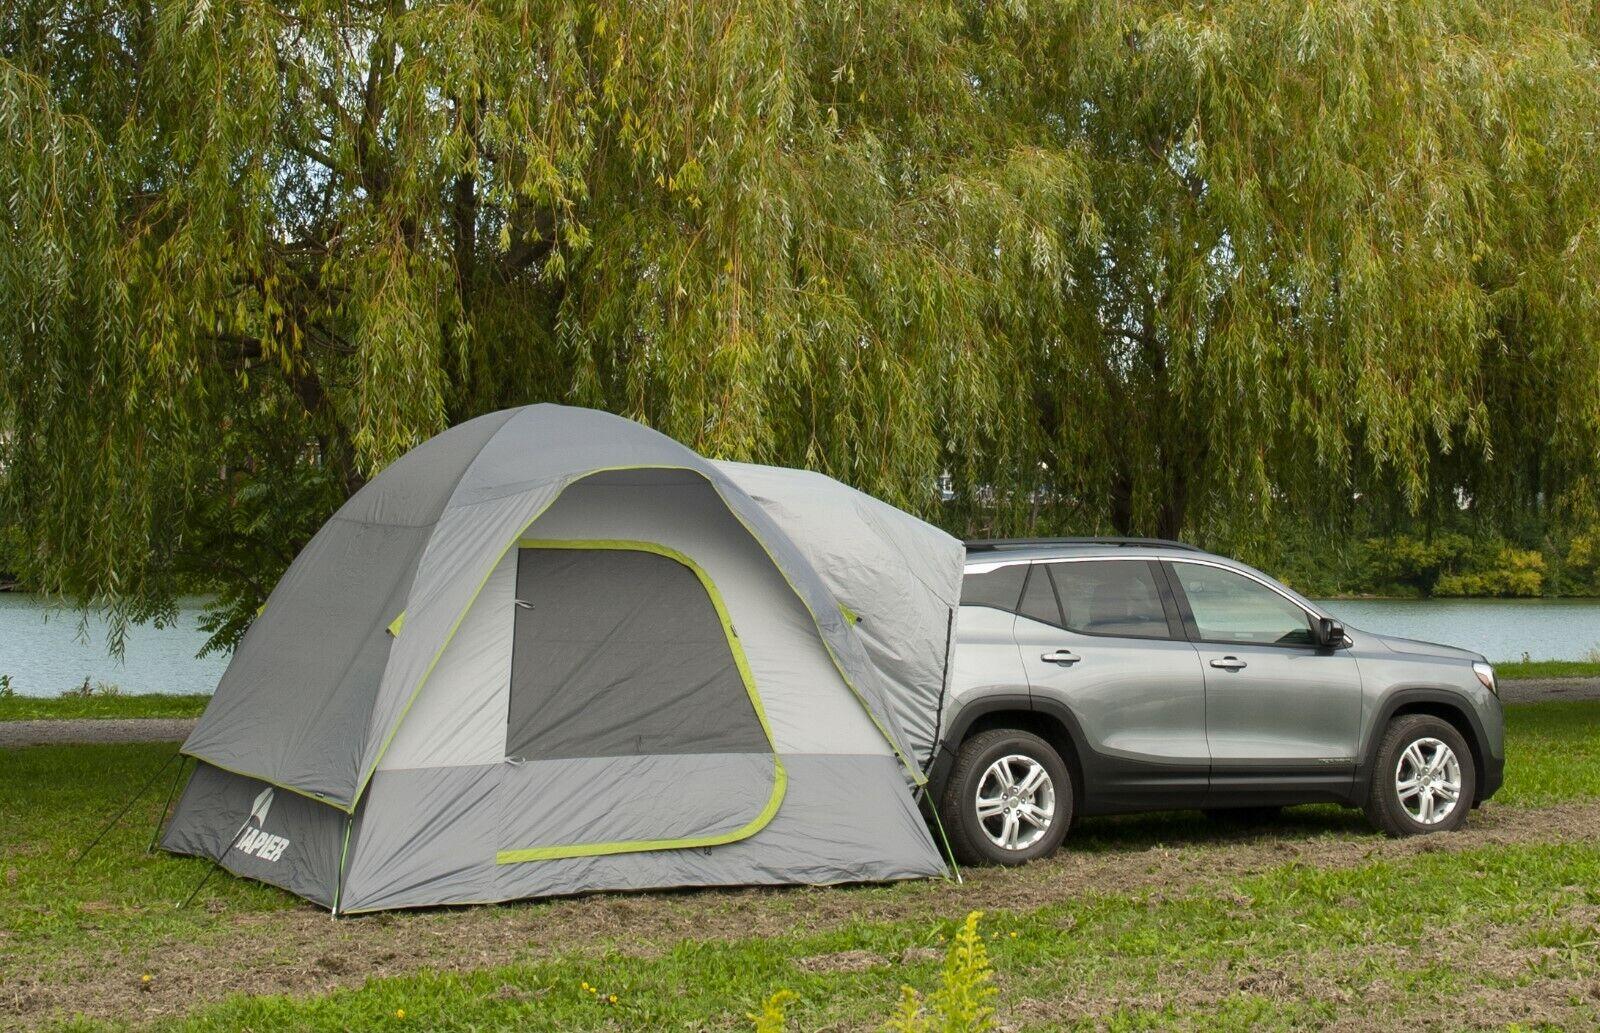 Napier Outdoors Backroadz 13100 Suv Tent For Sale Online Ebay